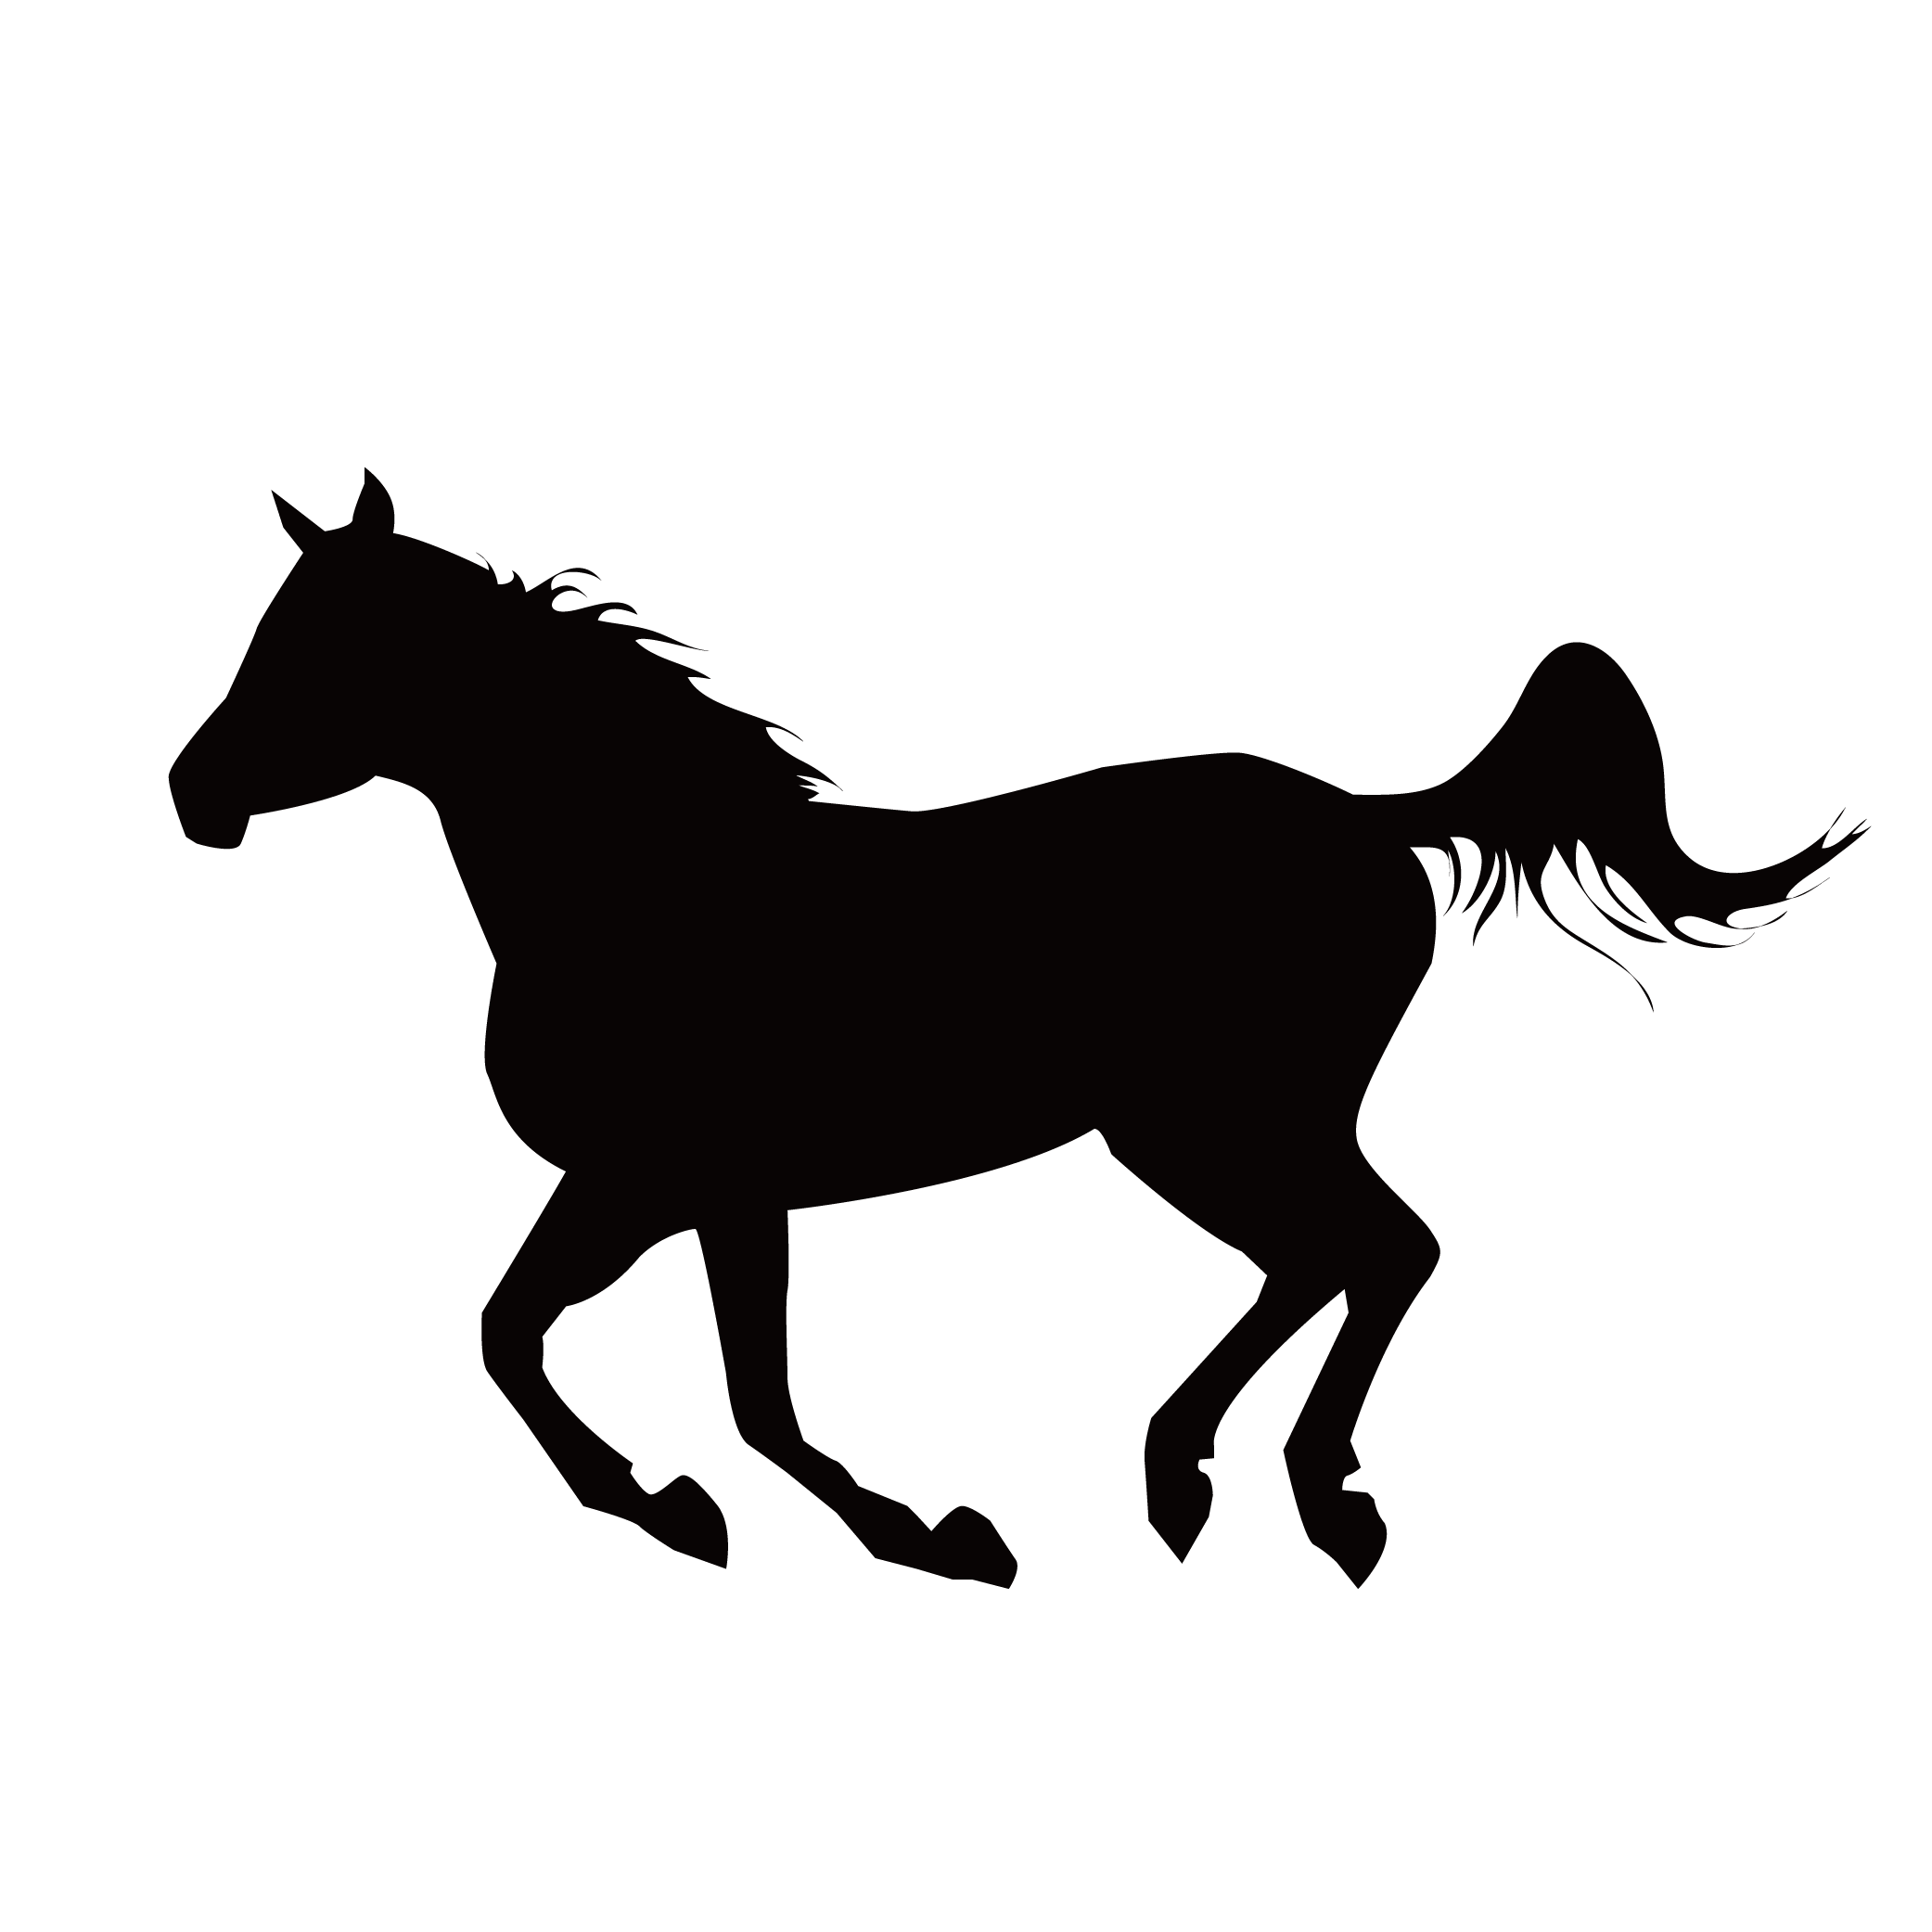 Mustang Stallion Equestrianism Clip art.